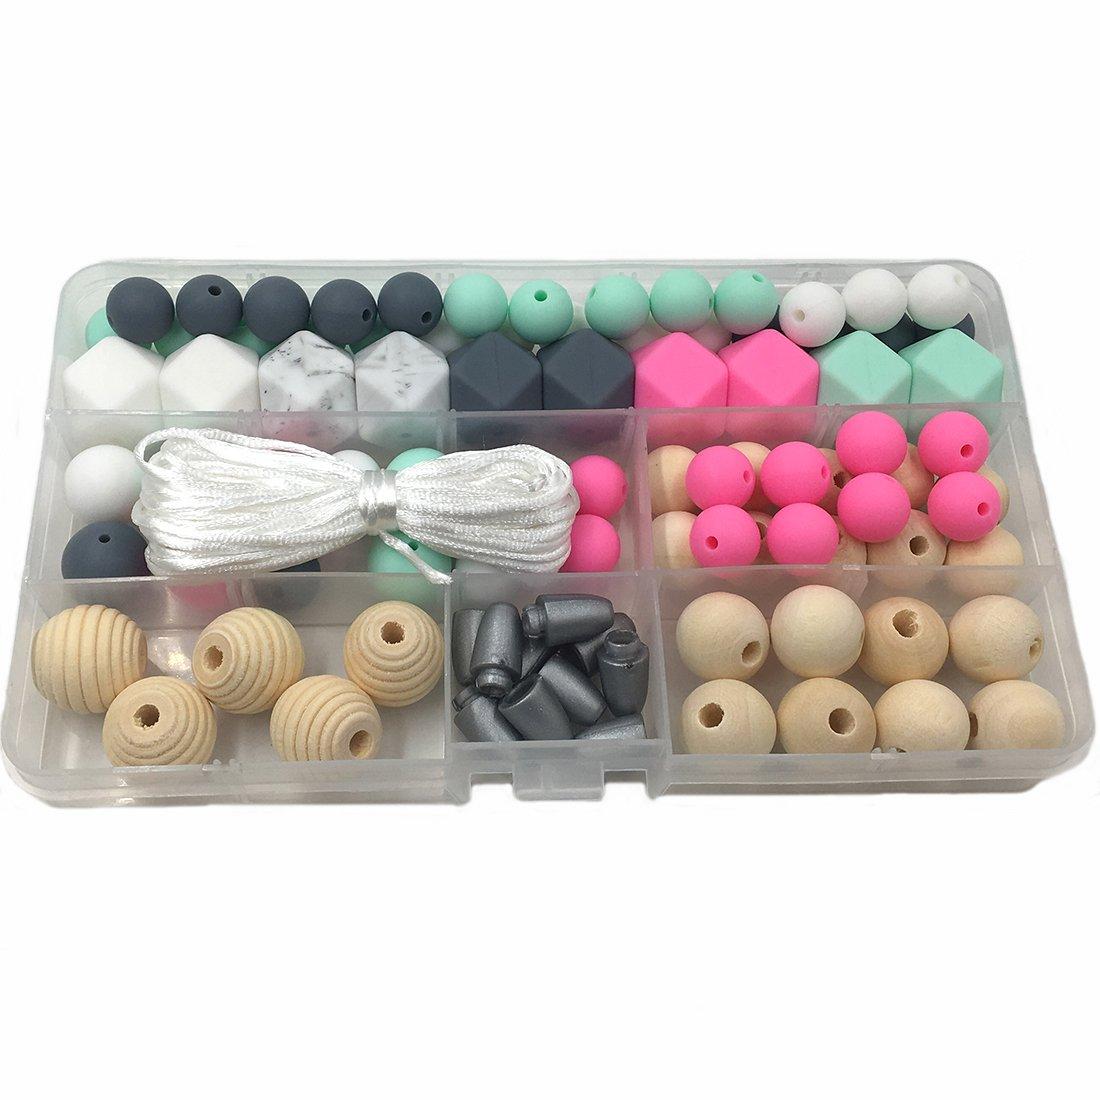 Coskiss conjuntos de mordedor de silicona diy collar de dentici/ón perlas pulsera hecha accesorios de calidad alimentaria de silicona perlas beb/é mordedor A187